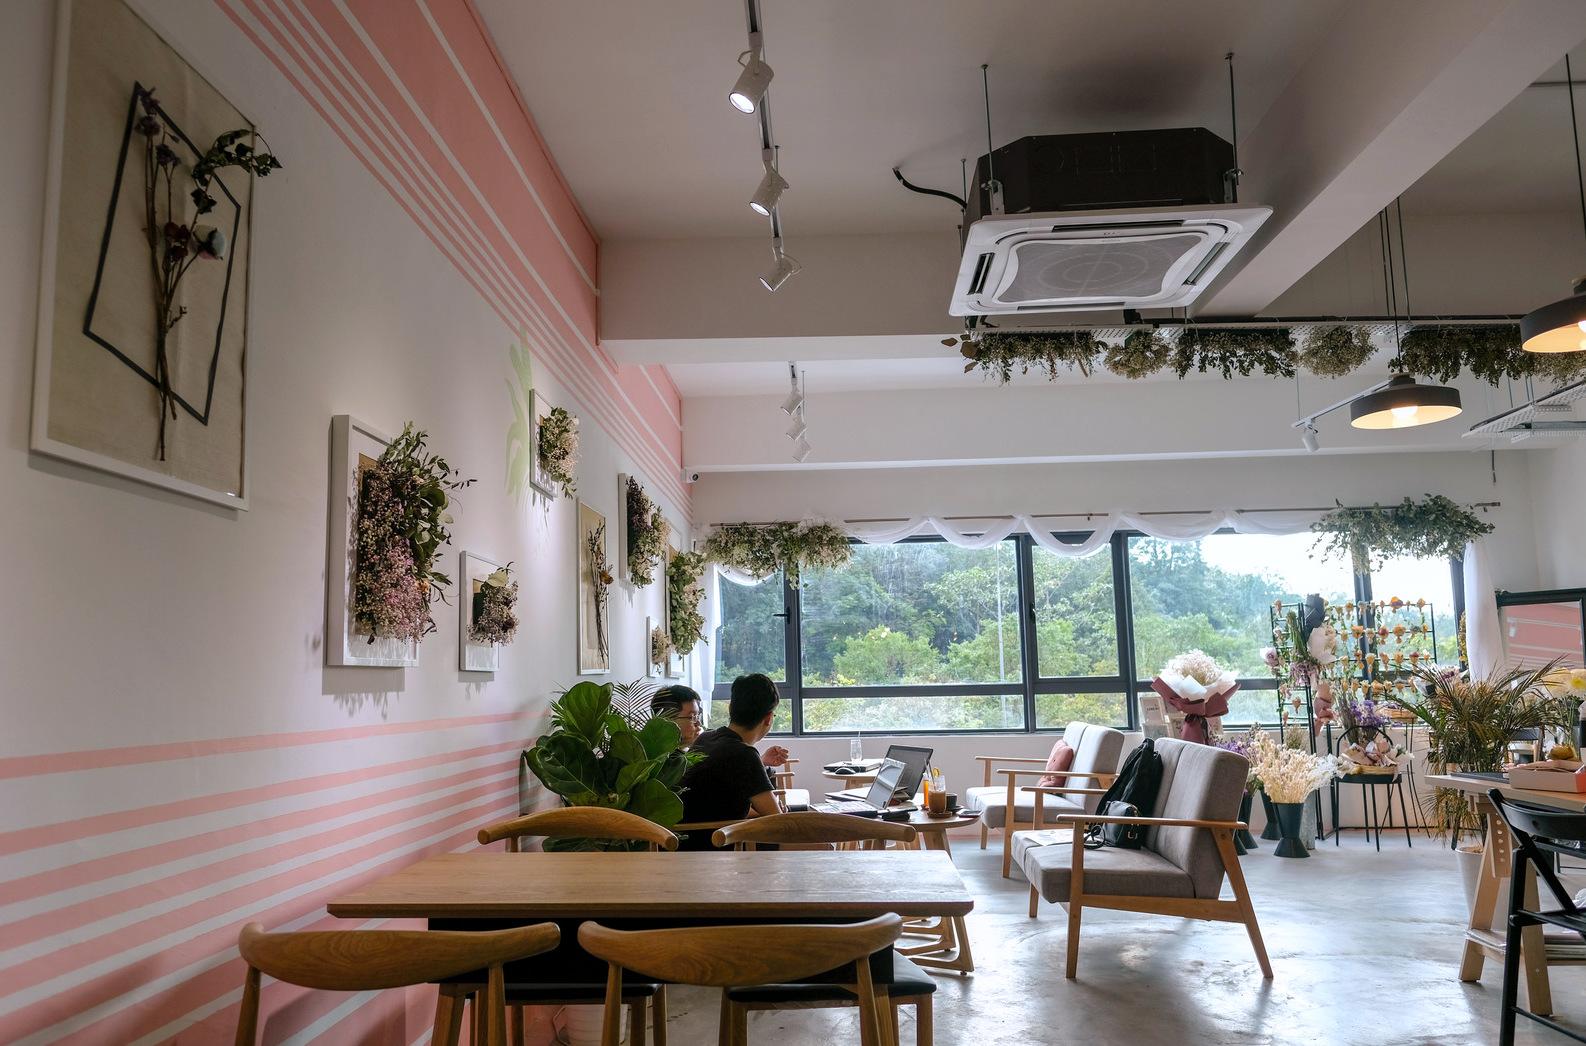 daisy & peony florist cafe, bukit jalil